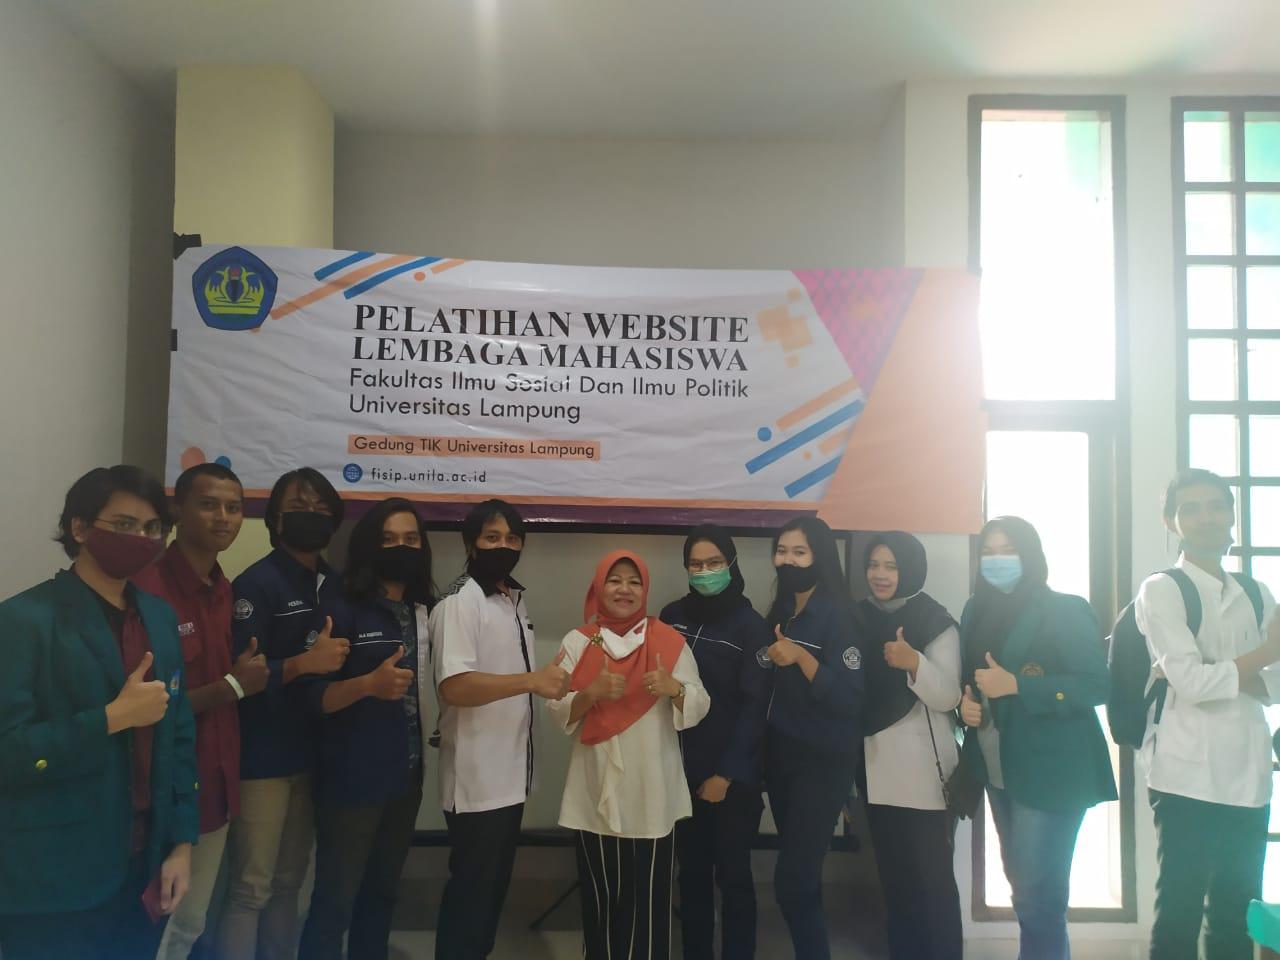 Pelatihan Website Lembaga Mahasiswa Universitas Lampung